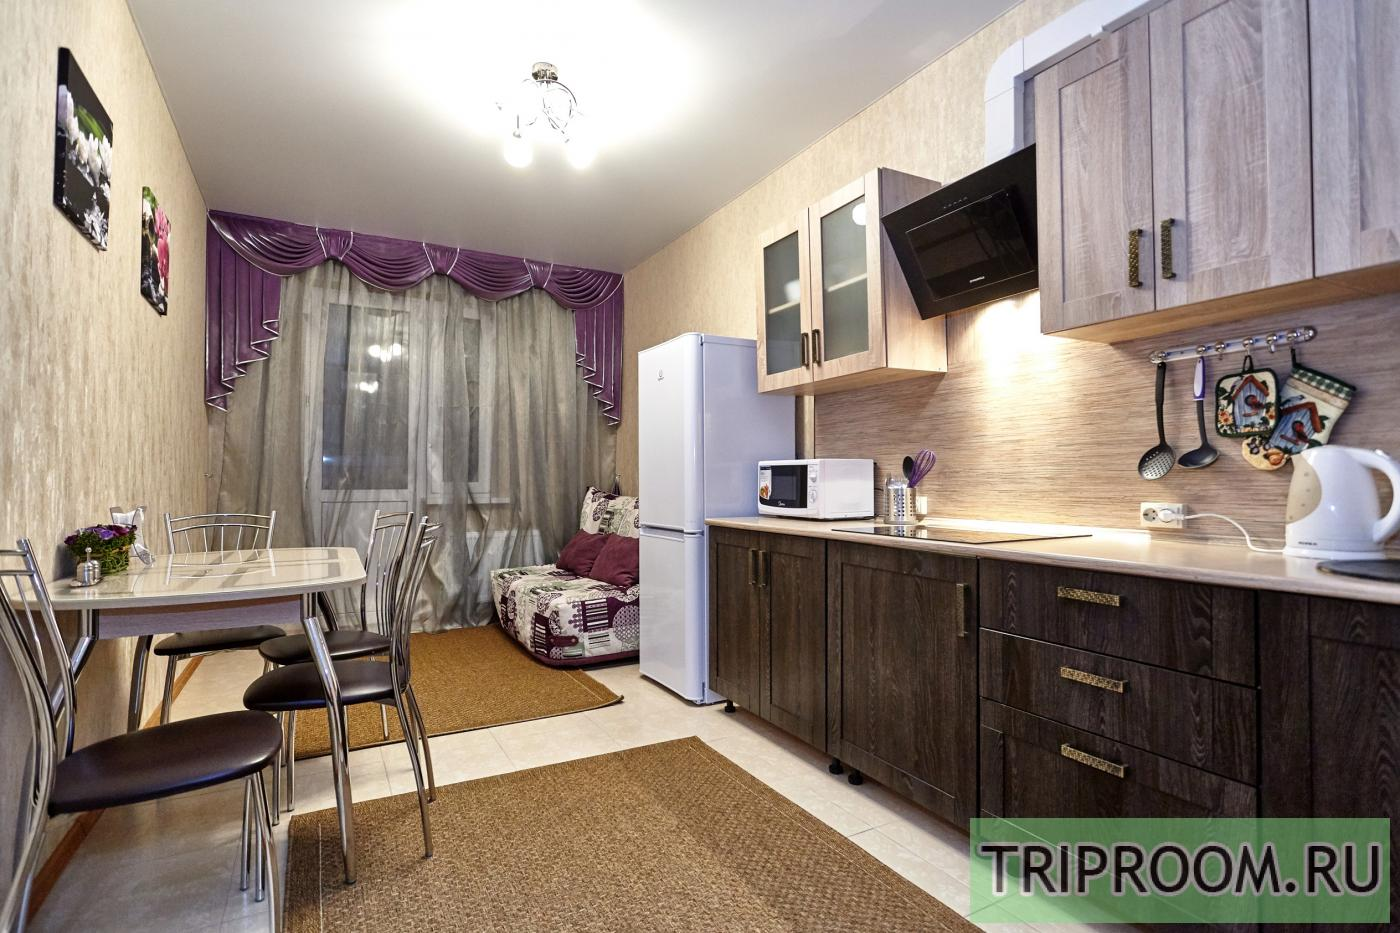 1-комнатная квартира посуточно (вариант № 6860), ул. Соколова улица, фото № 6